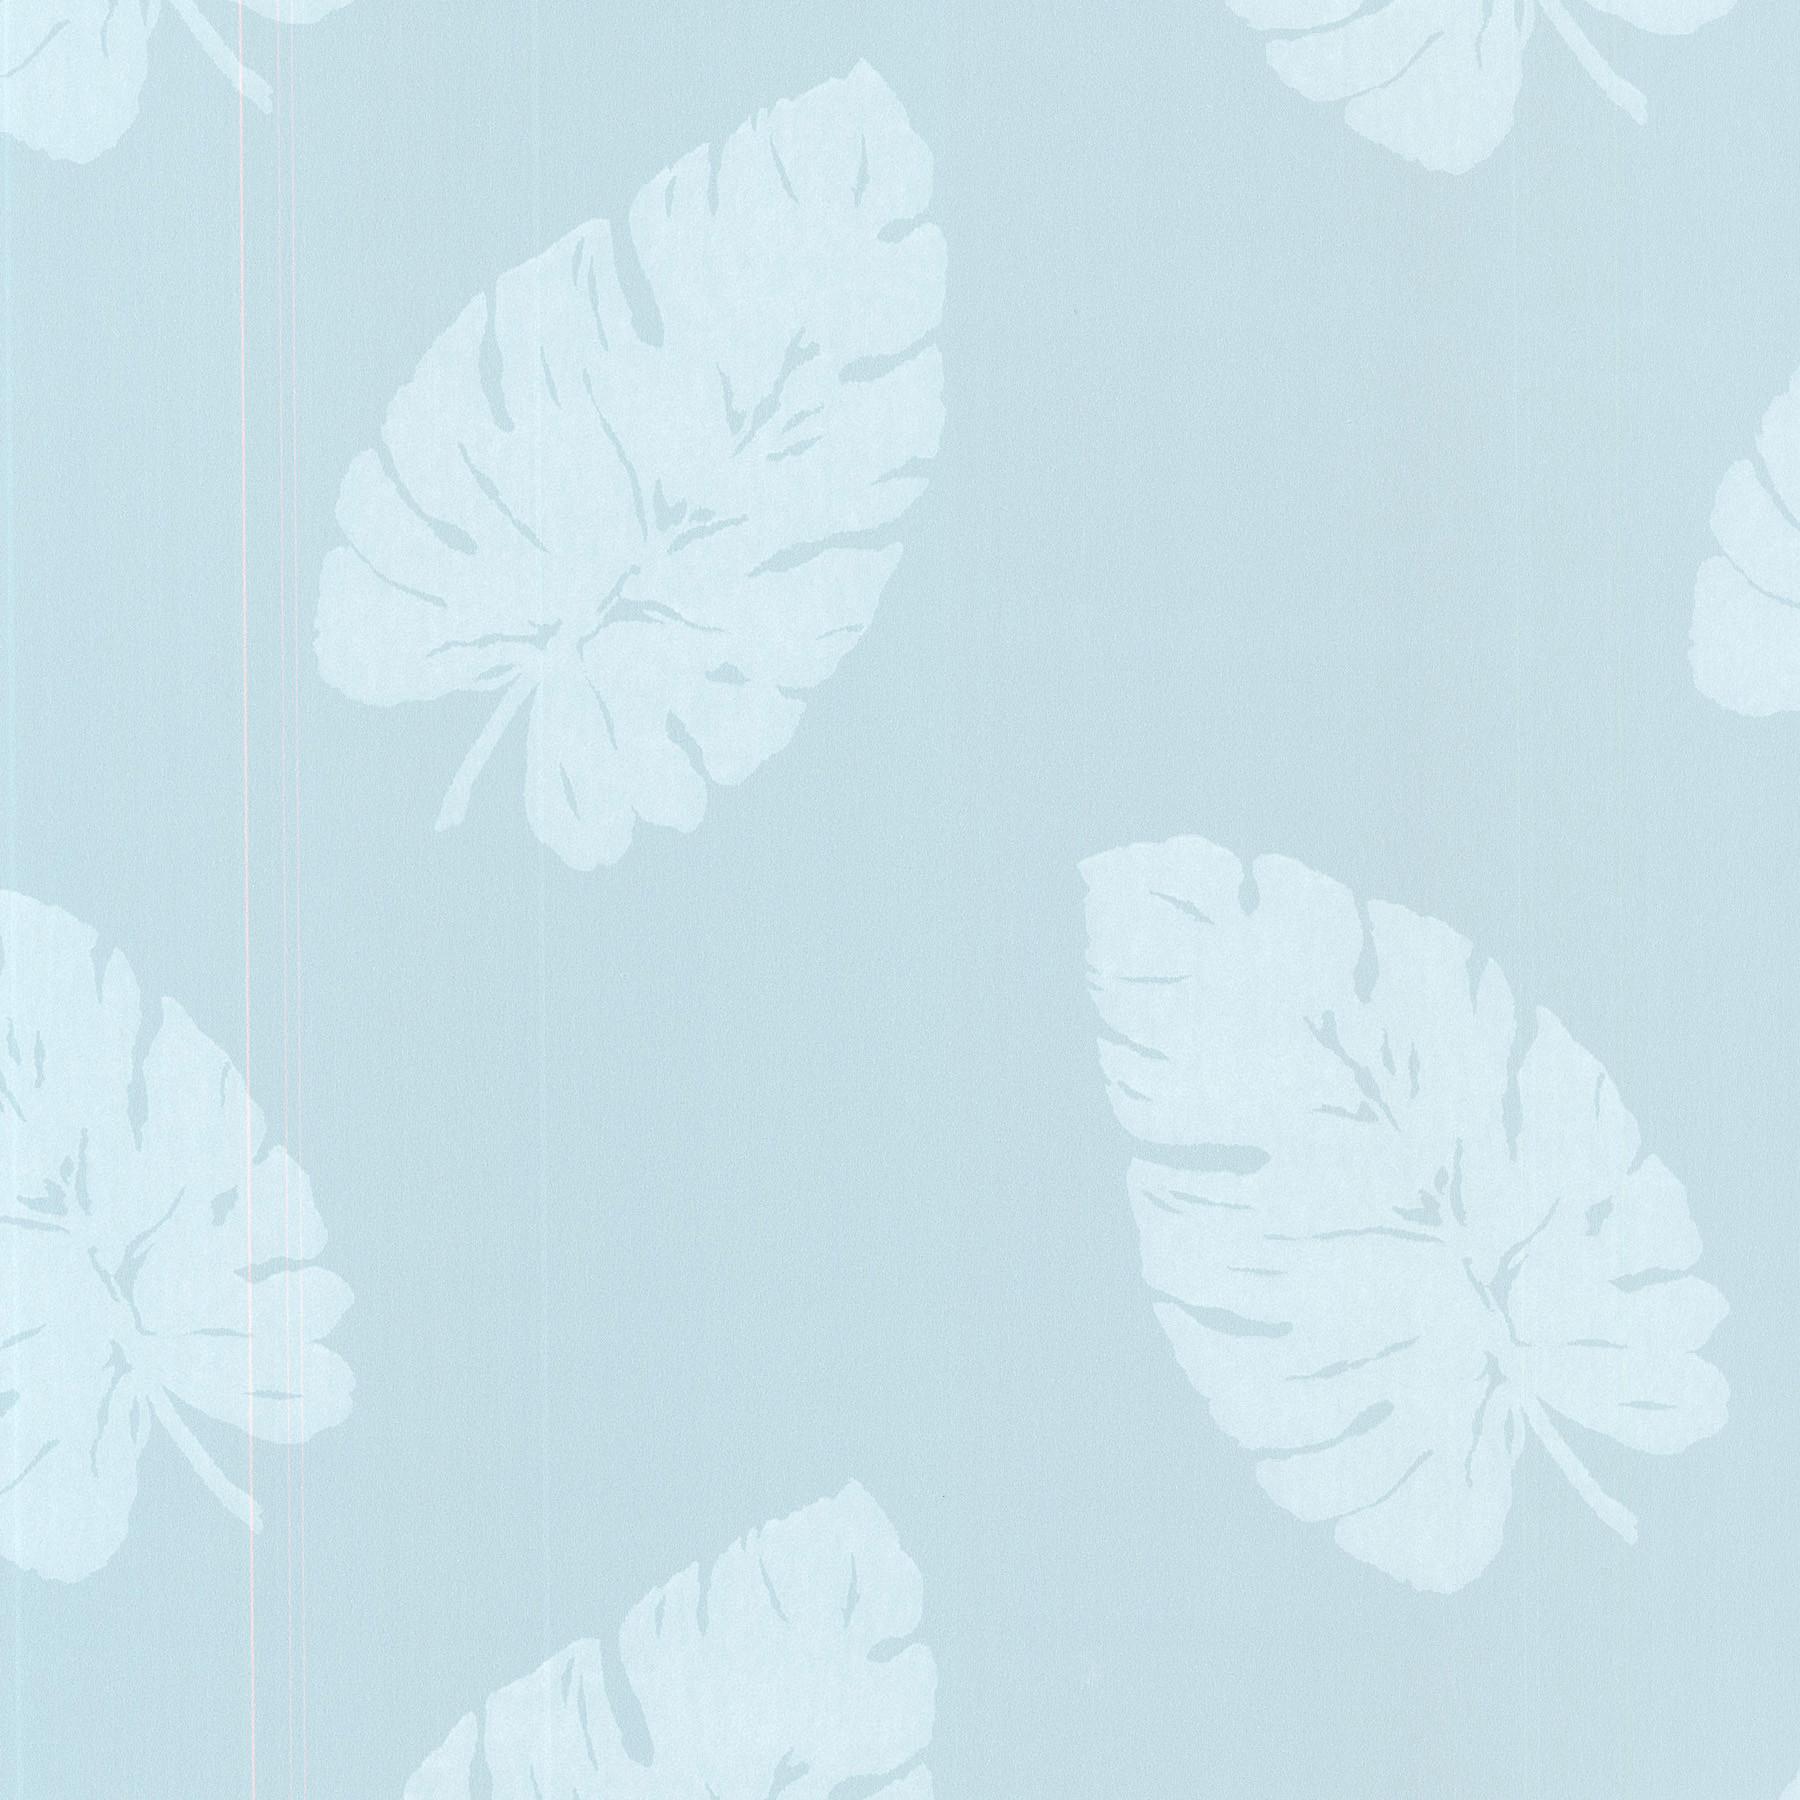 Bath Volume IV Charlie 33 x 205 Banana Leaf 3D Embossed Wallpaper 1800x1800